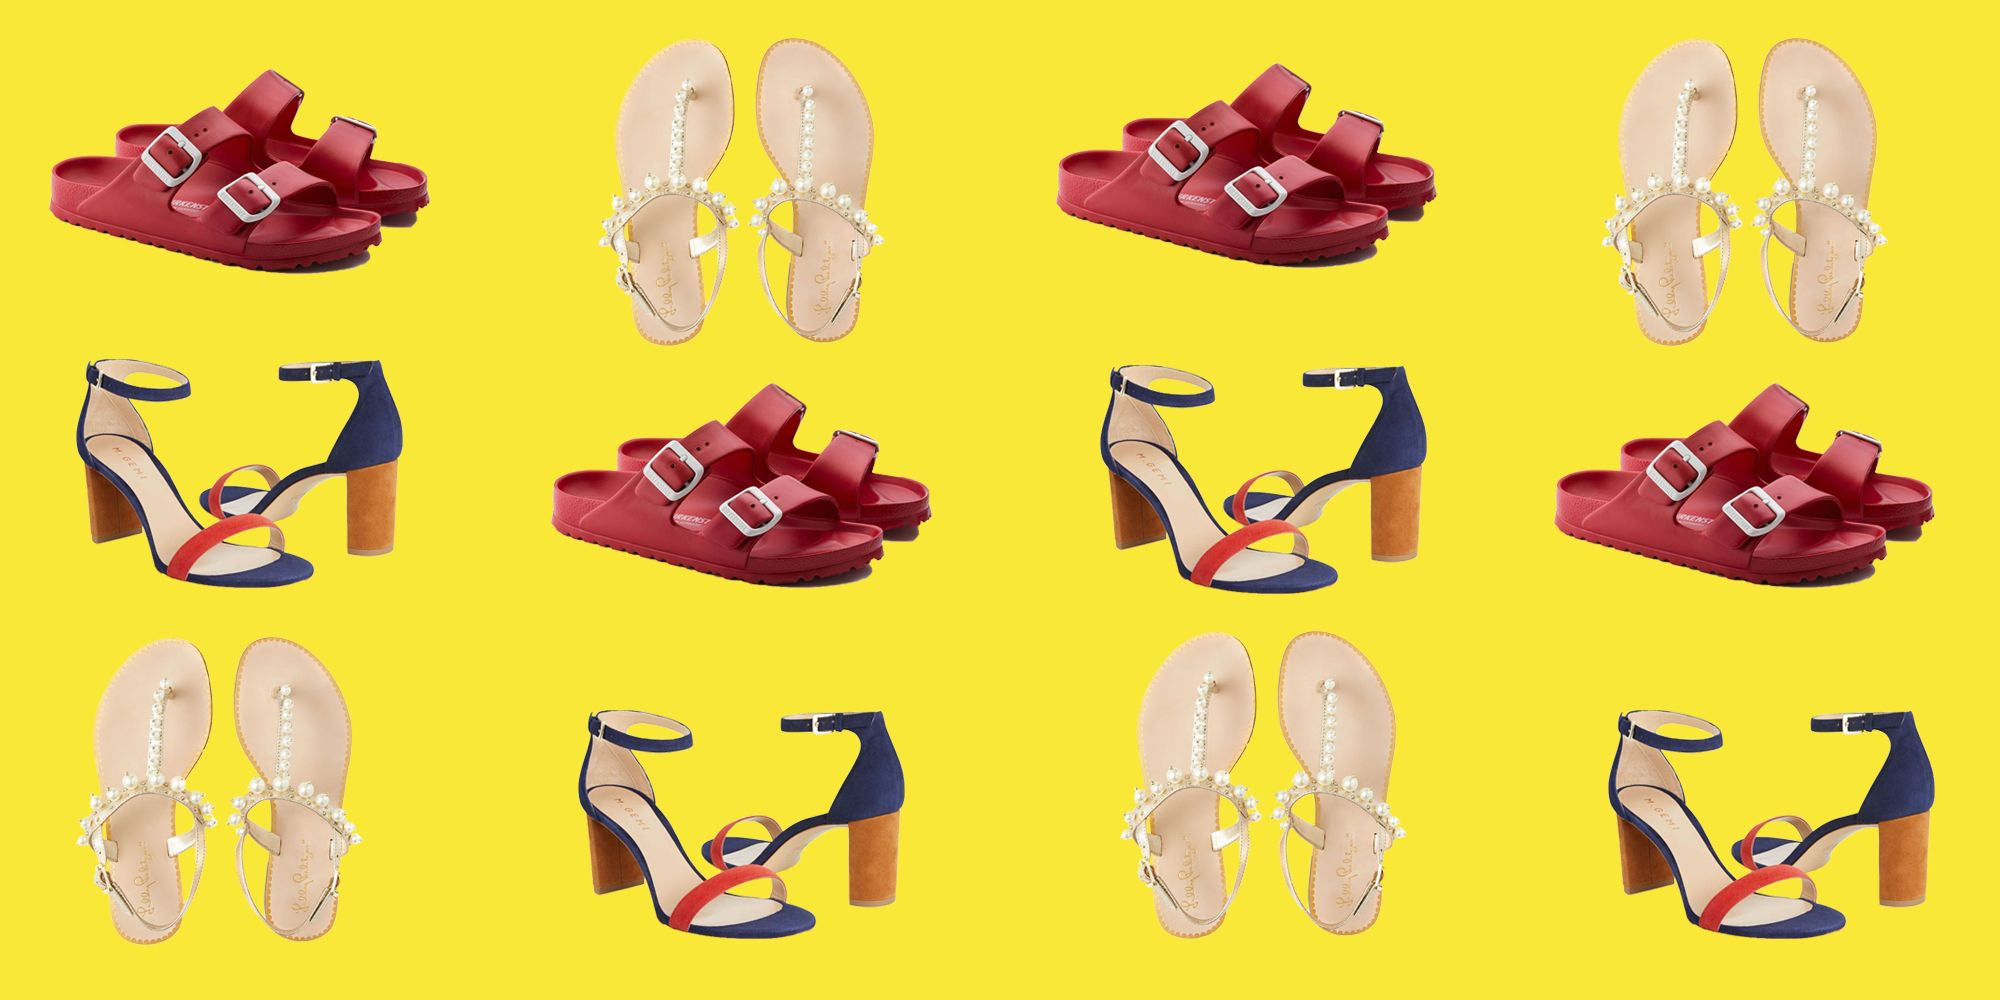 5b12c0c5c6e6f4 17 Comfy Sandals Women Can Walk In All Summer 2019